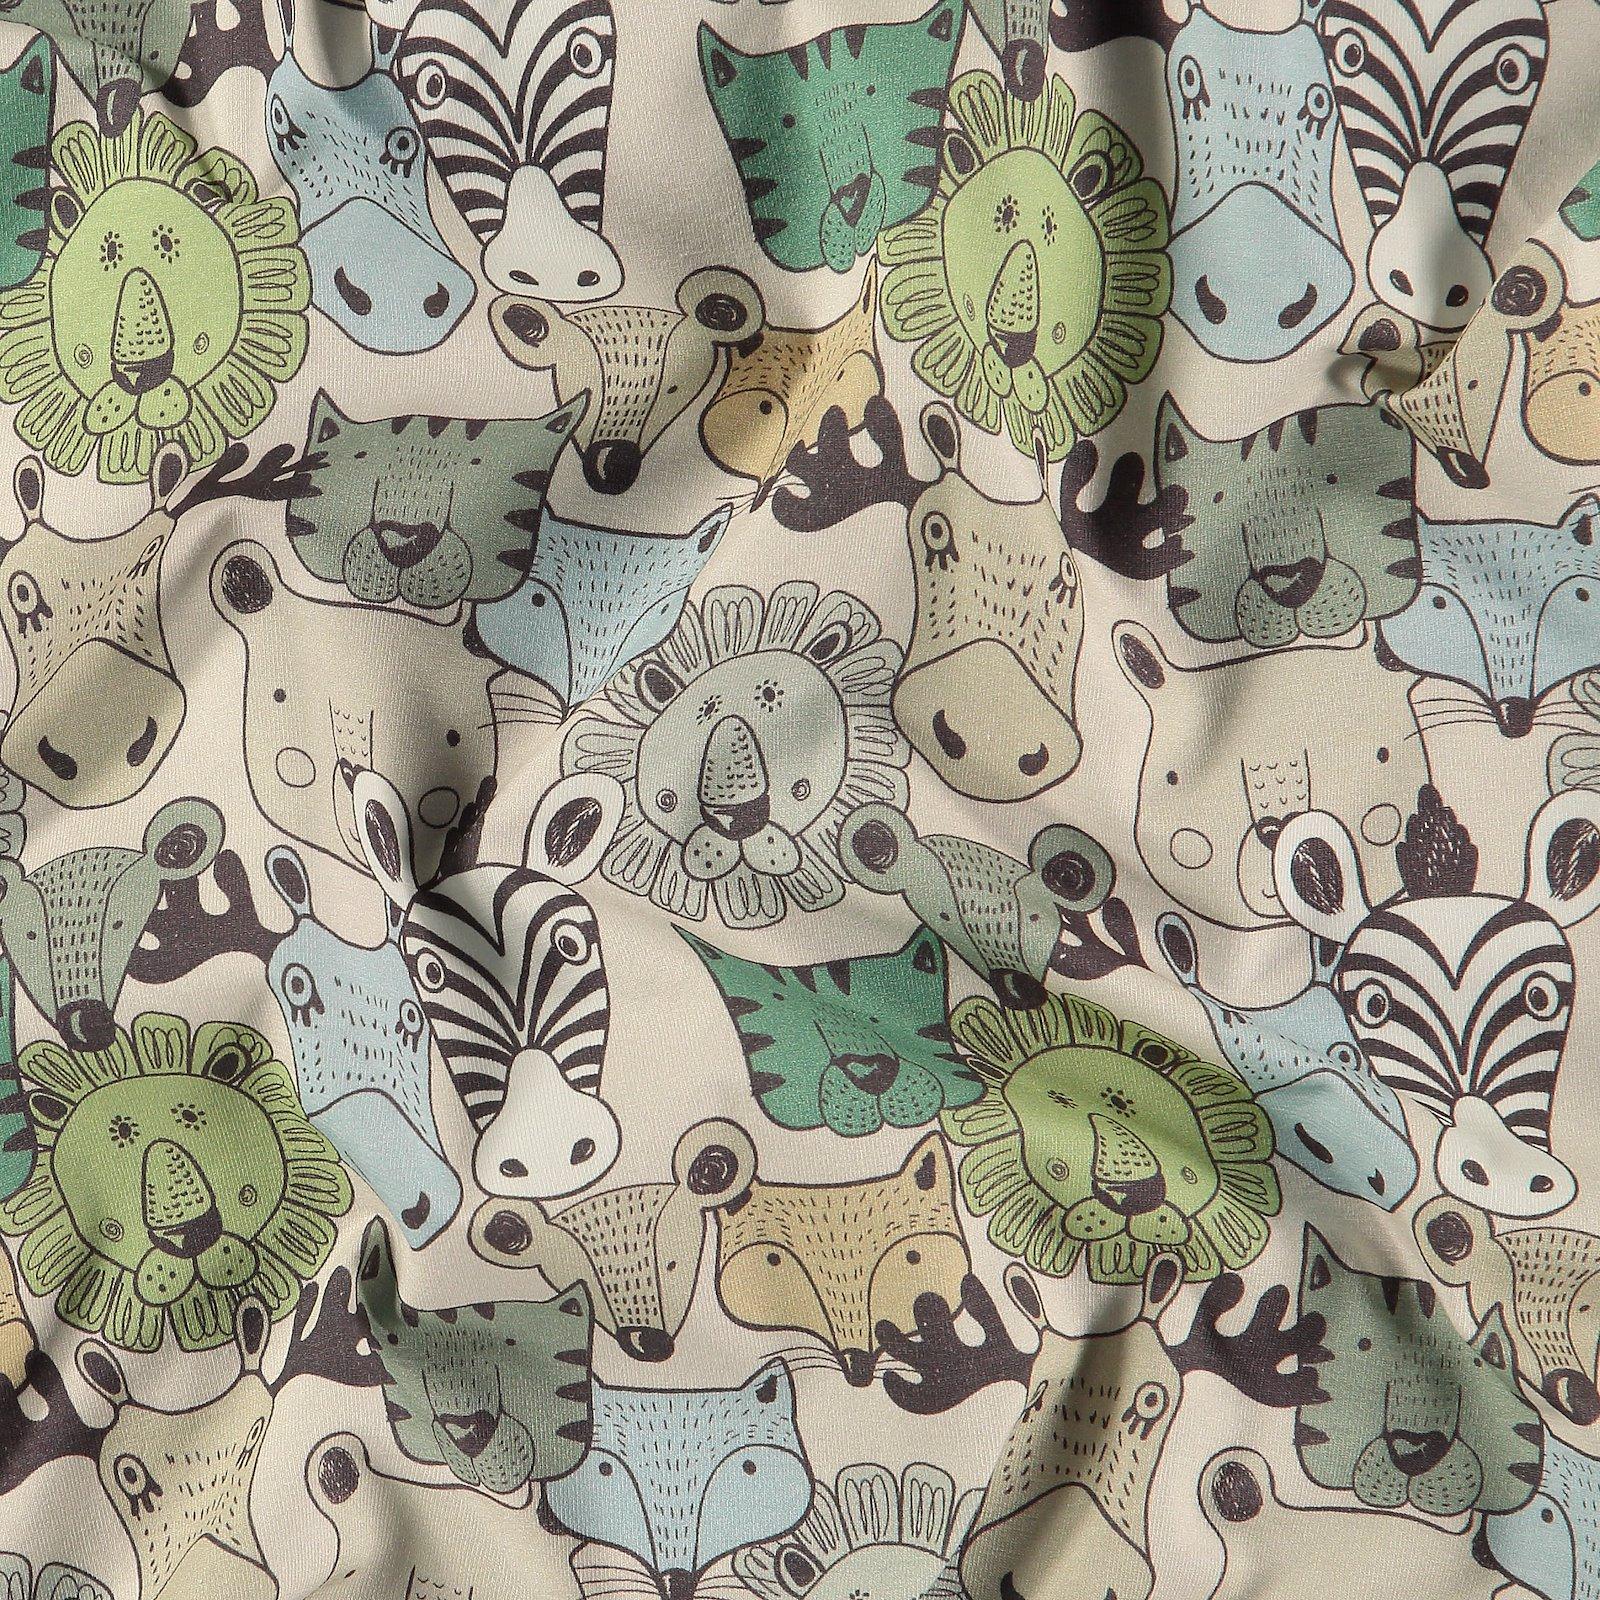 Organic stretch jersey putty w animals